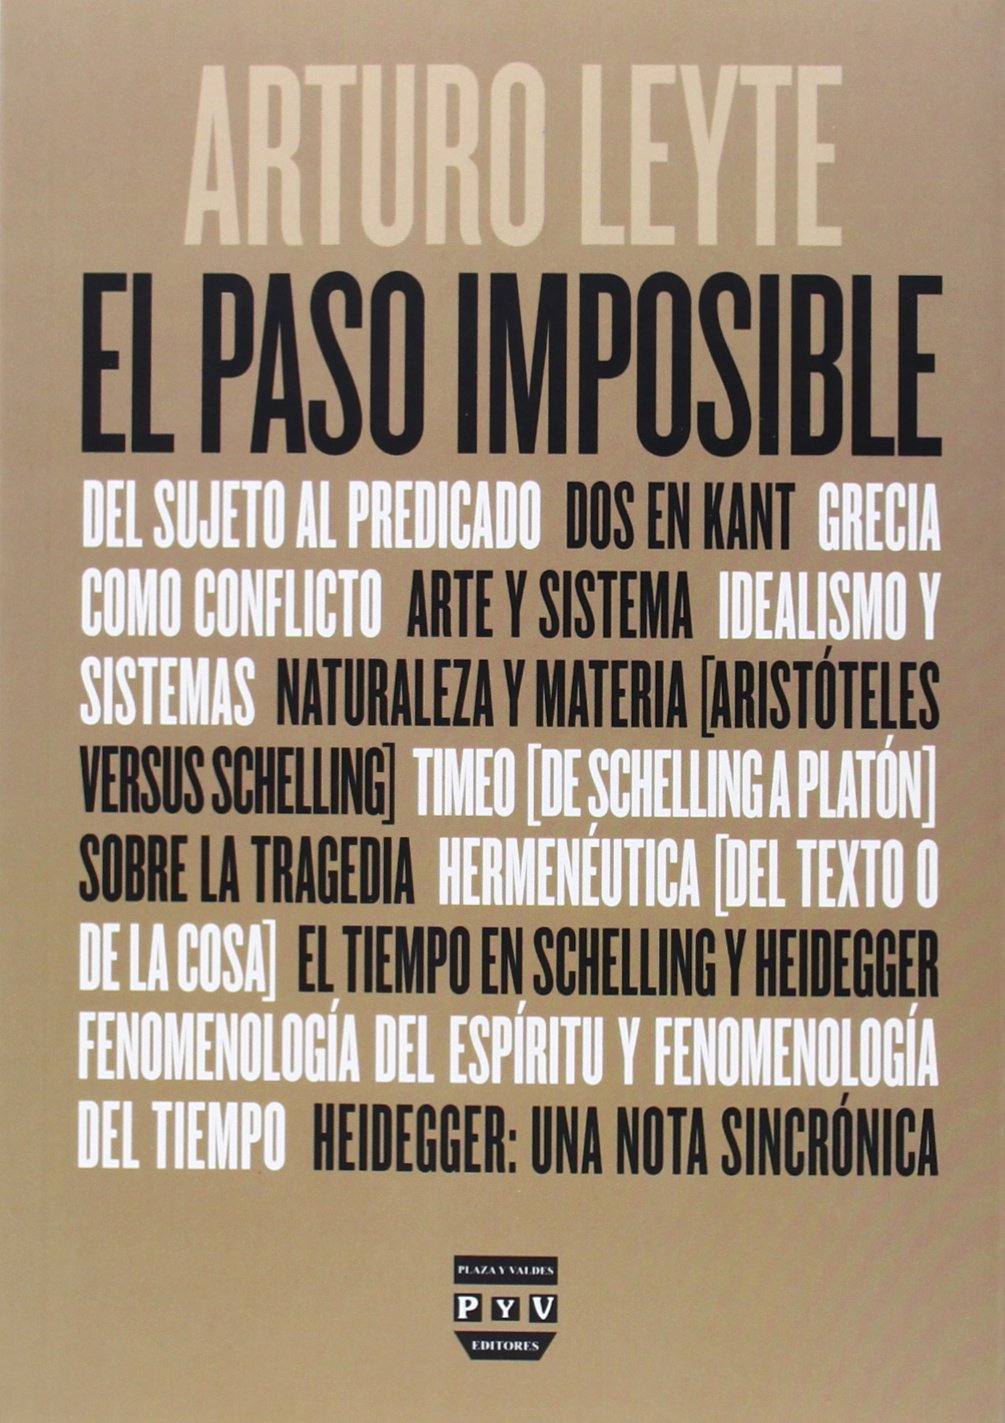 El paso imposible (Spanish) Paperback – December 1, 2013